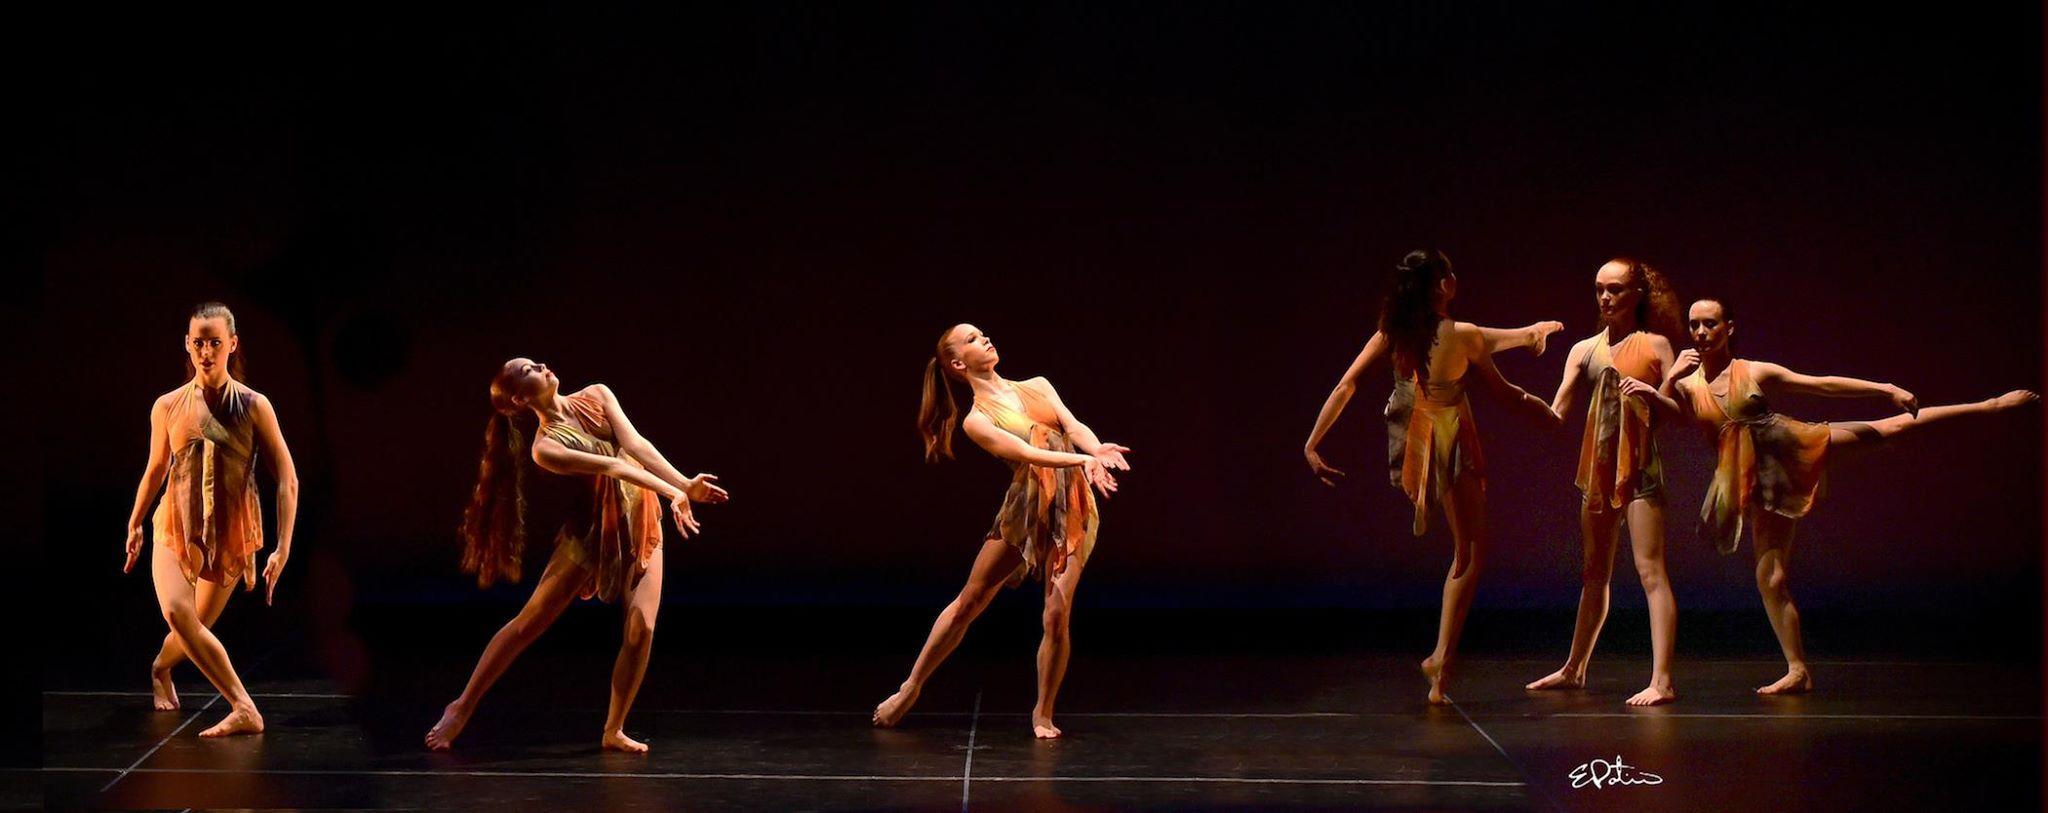 Pennsylvania Regional Ballet in Danielle Smith Guillermo's Rites of Harvest (2016)